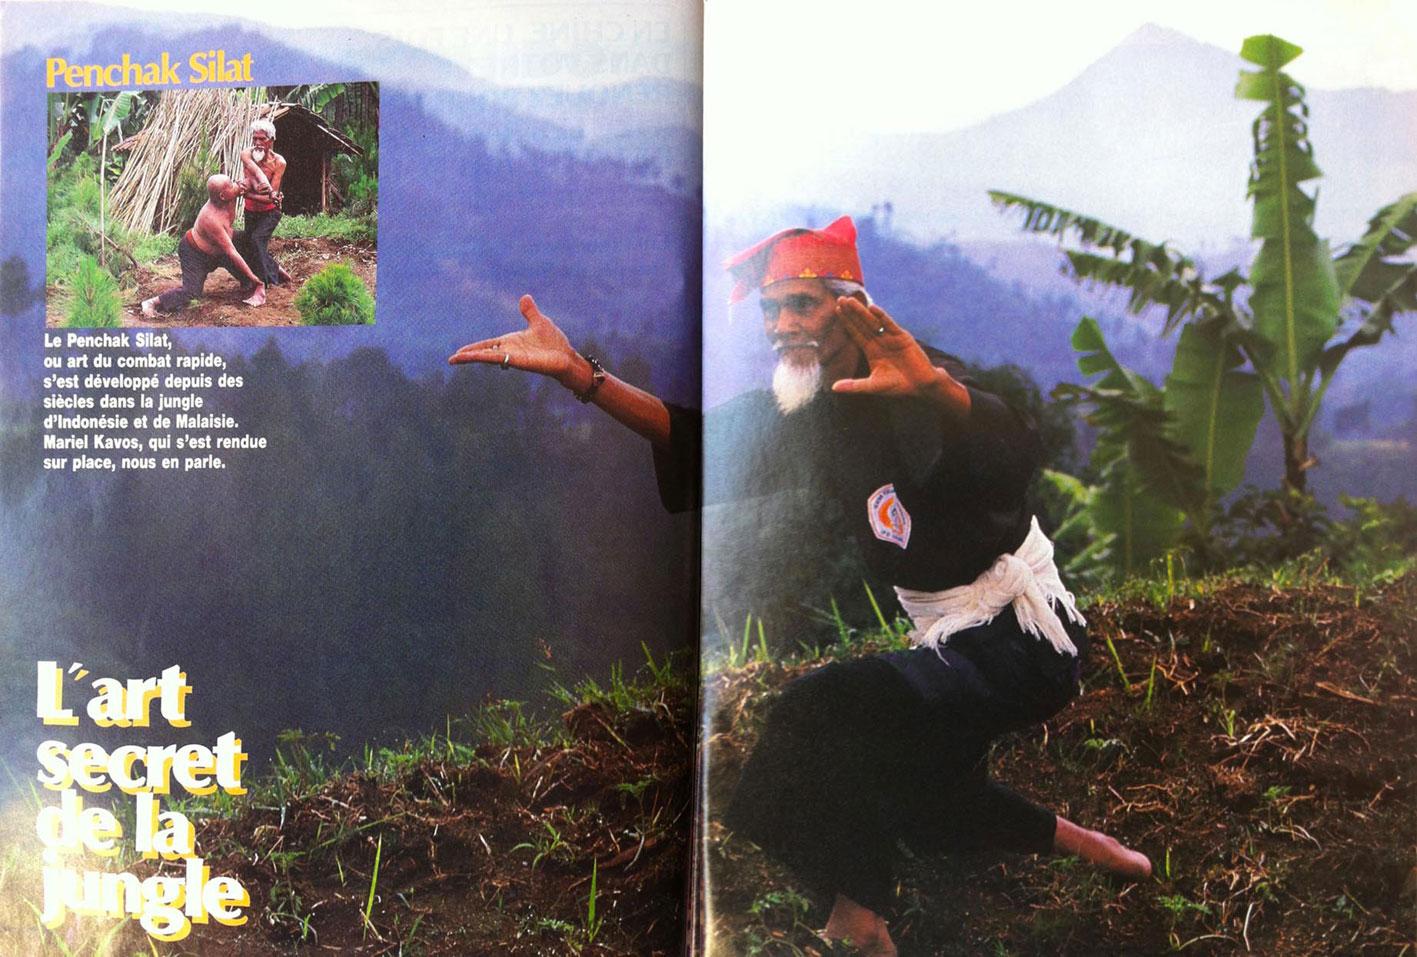 Penchak Silat - L'Art Secret de la Jungle - photo